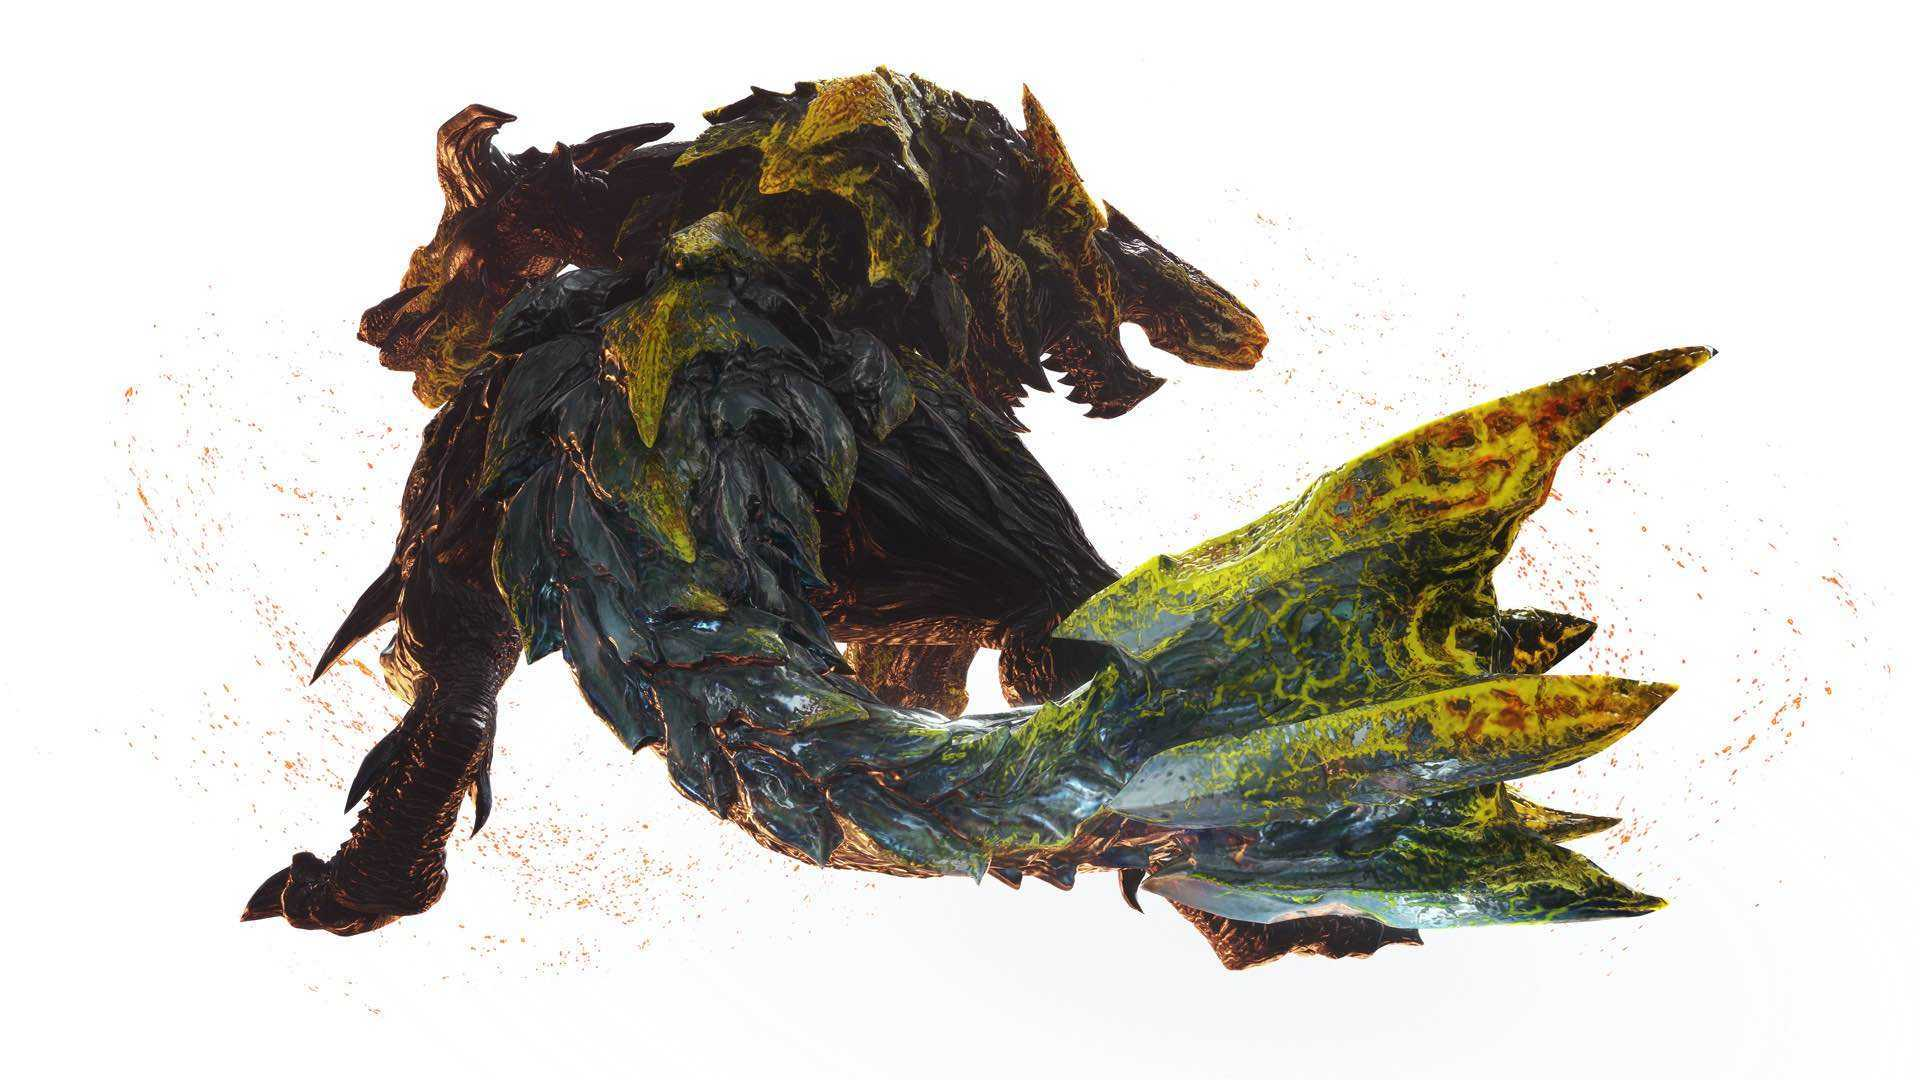 Monster Hunter World Raging Brachydios